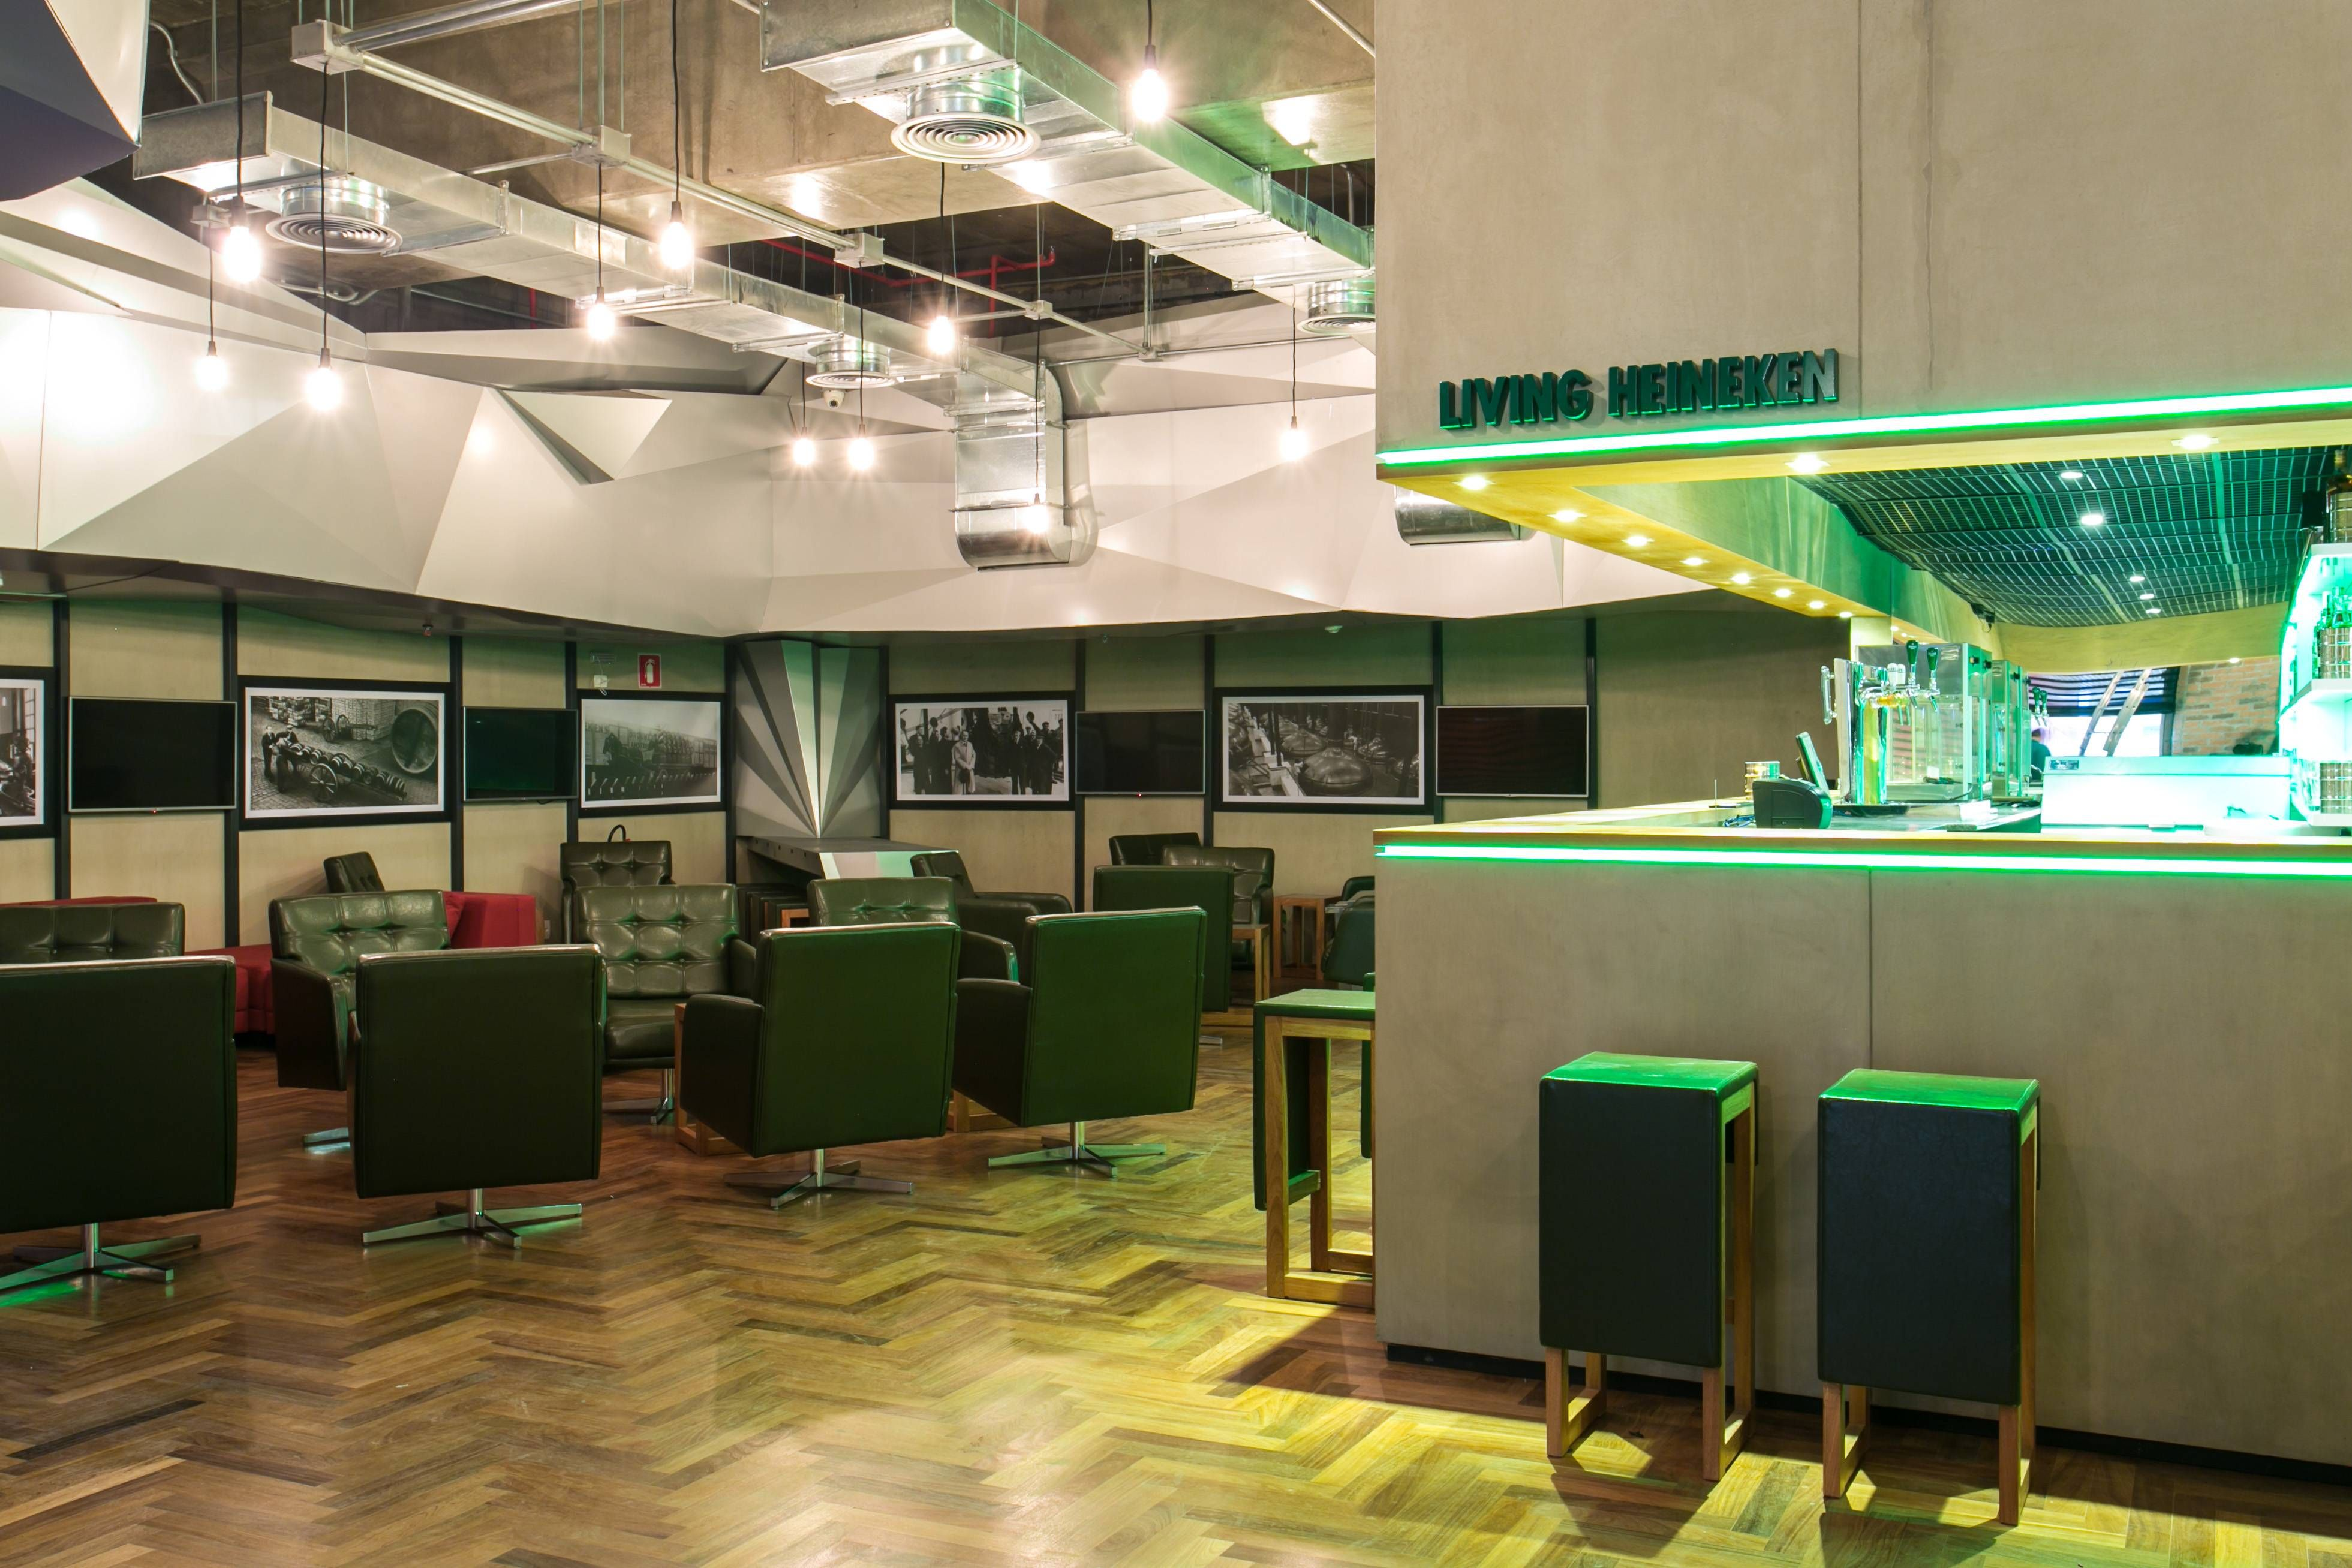 bar Heineken aeroporto guarulhos